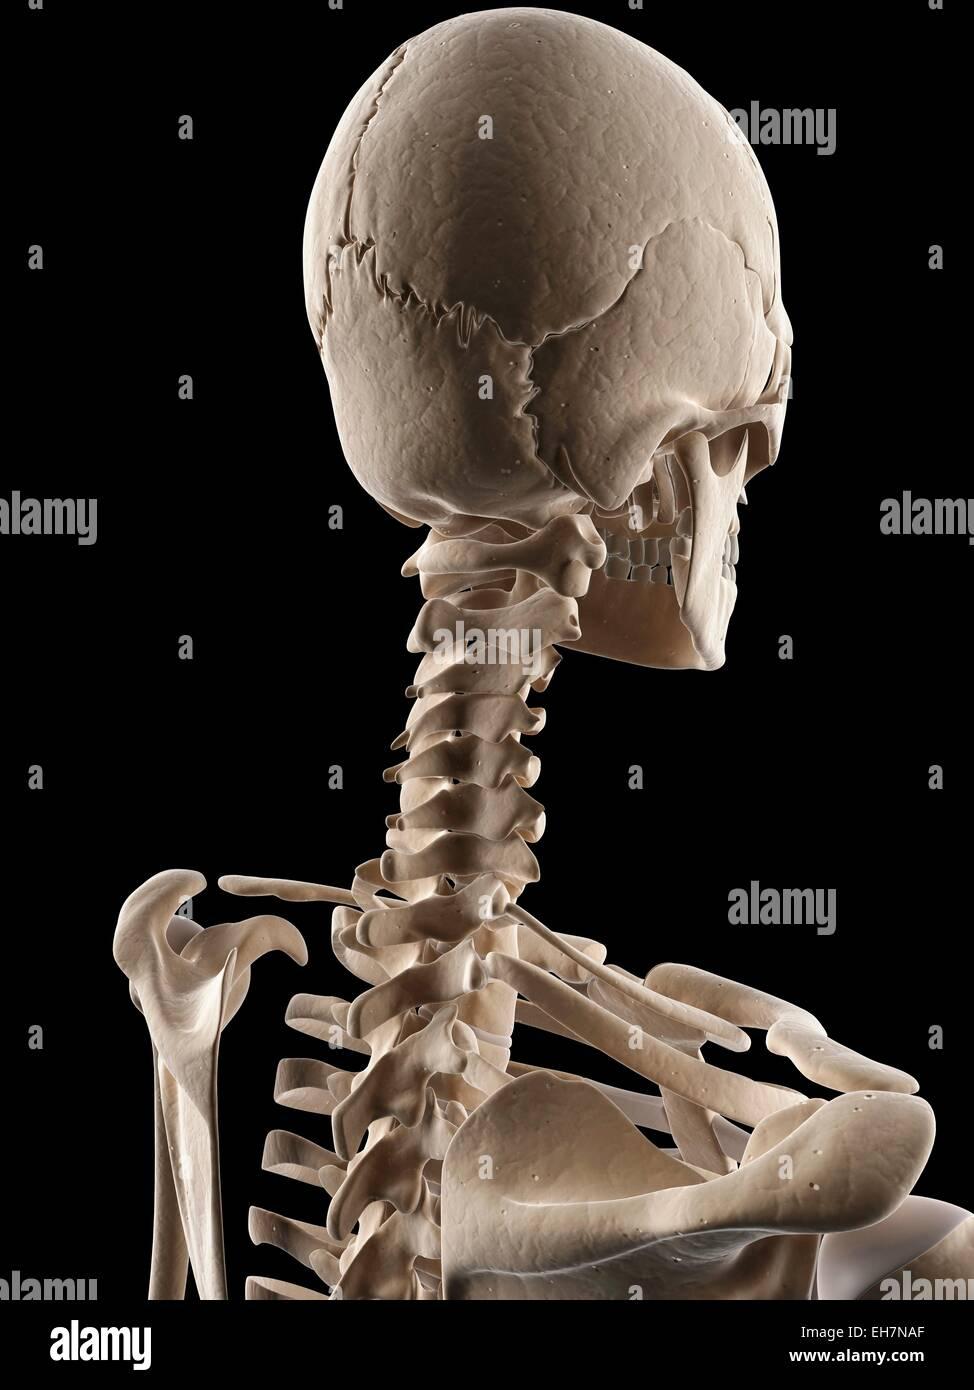 Human skull and neck bones illustration stock photo 79461047 alamy human skull and neck bones illustration ccuart Gallery